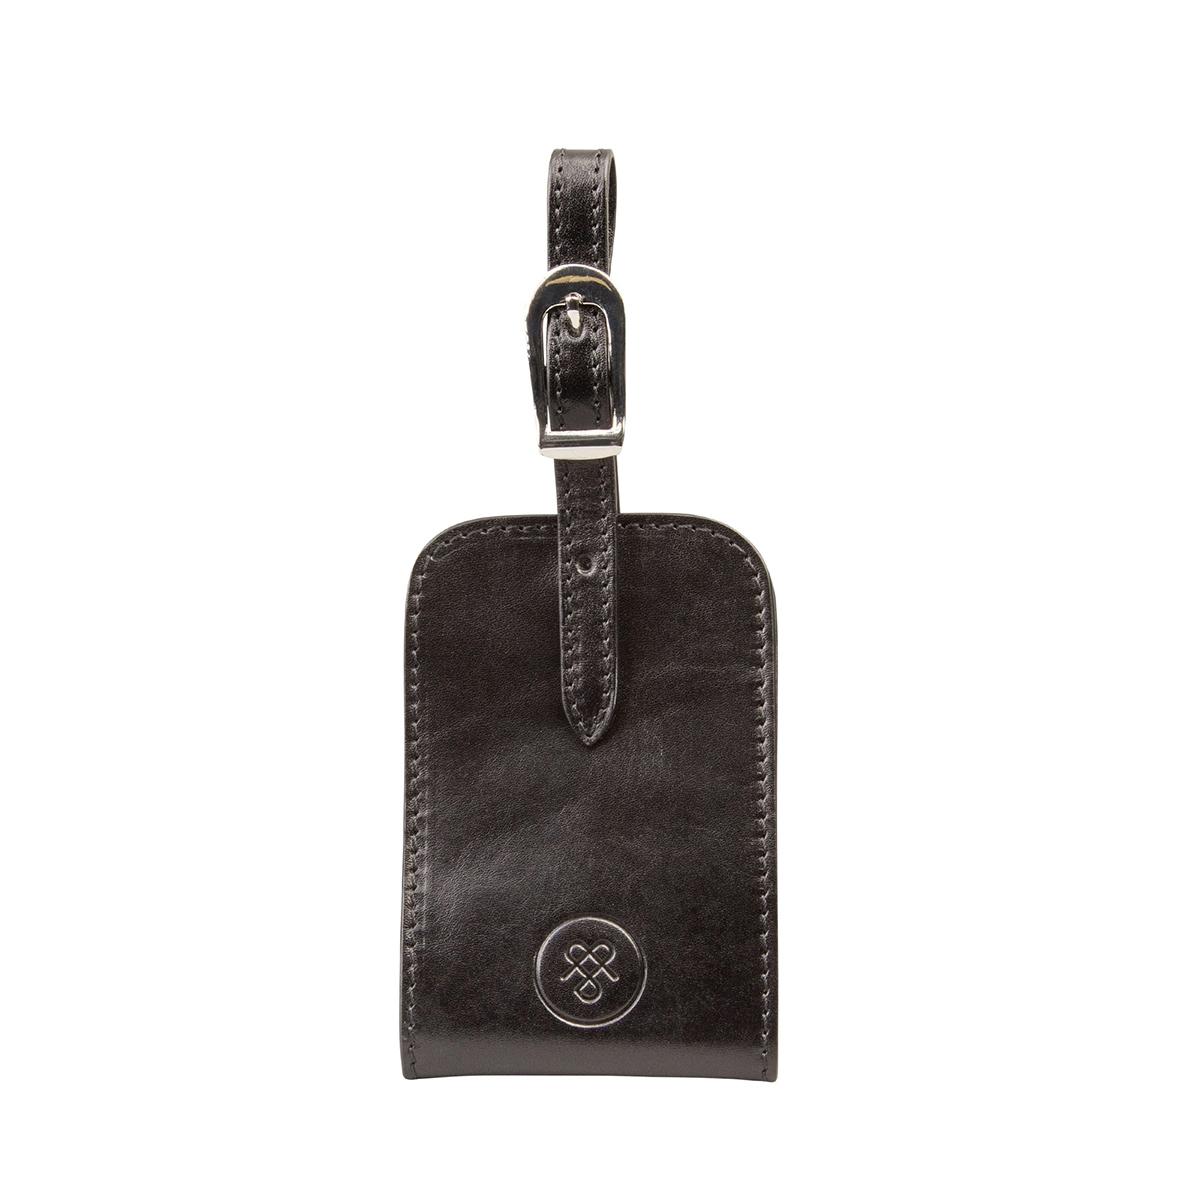 MAXWELL SCOTT BAGS Luxury Black Leather Id Luggage Tag